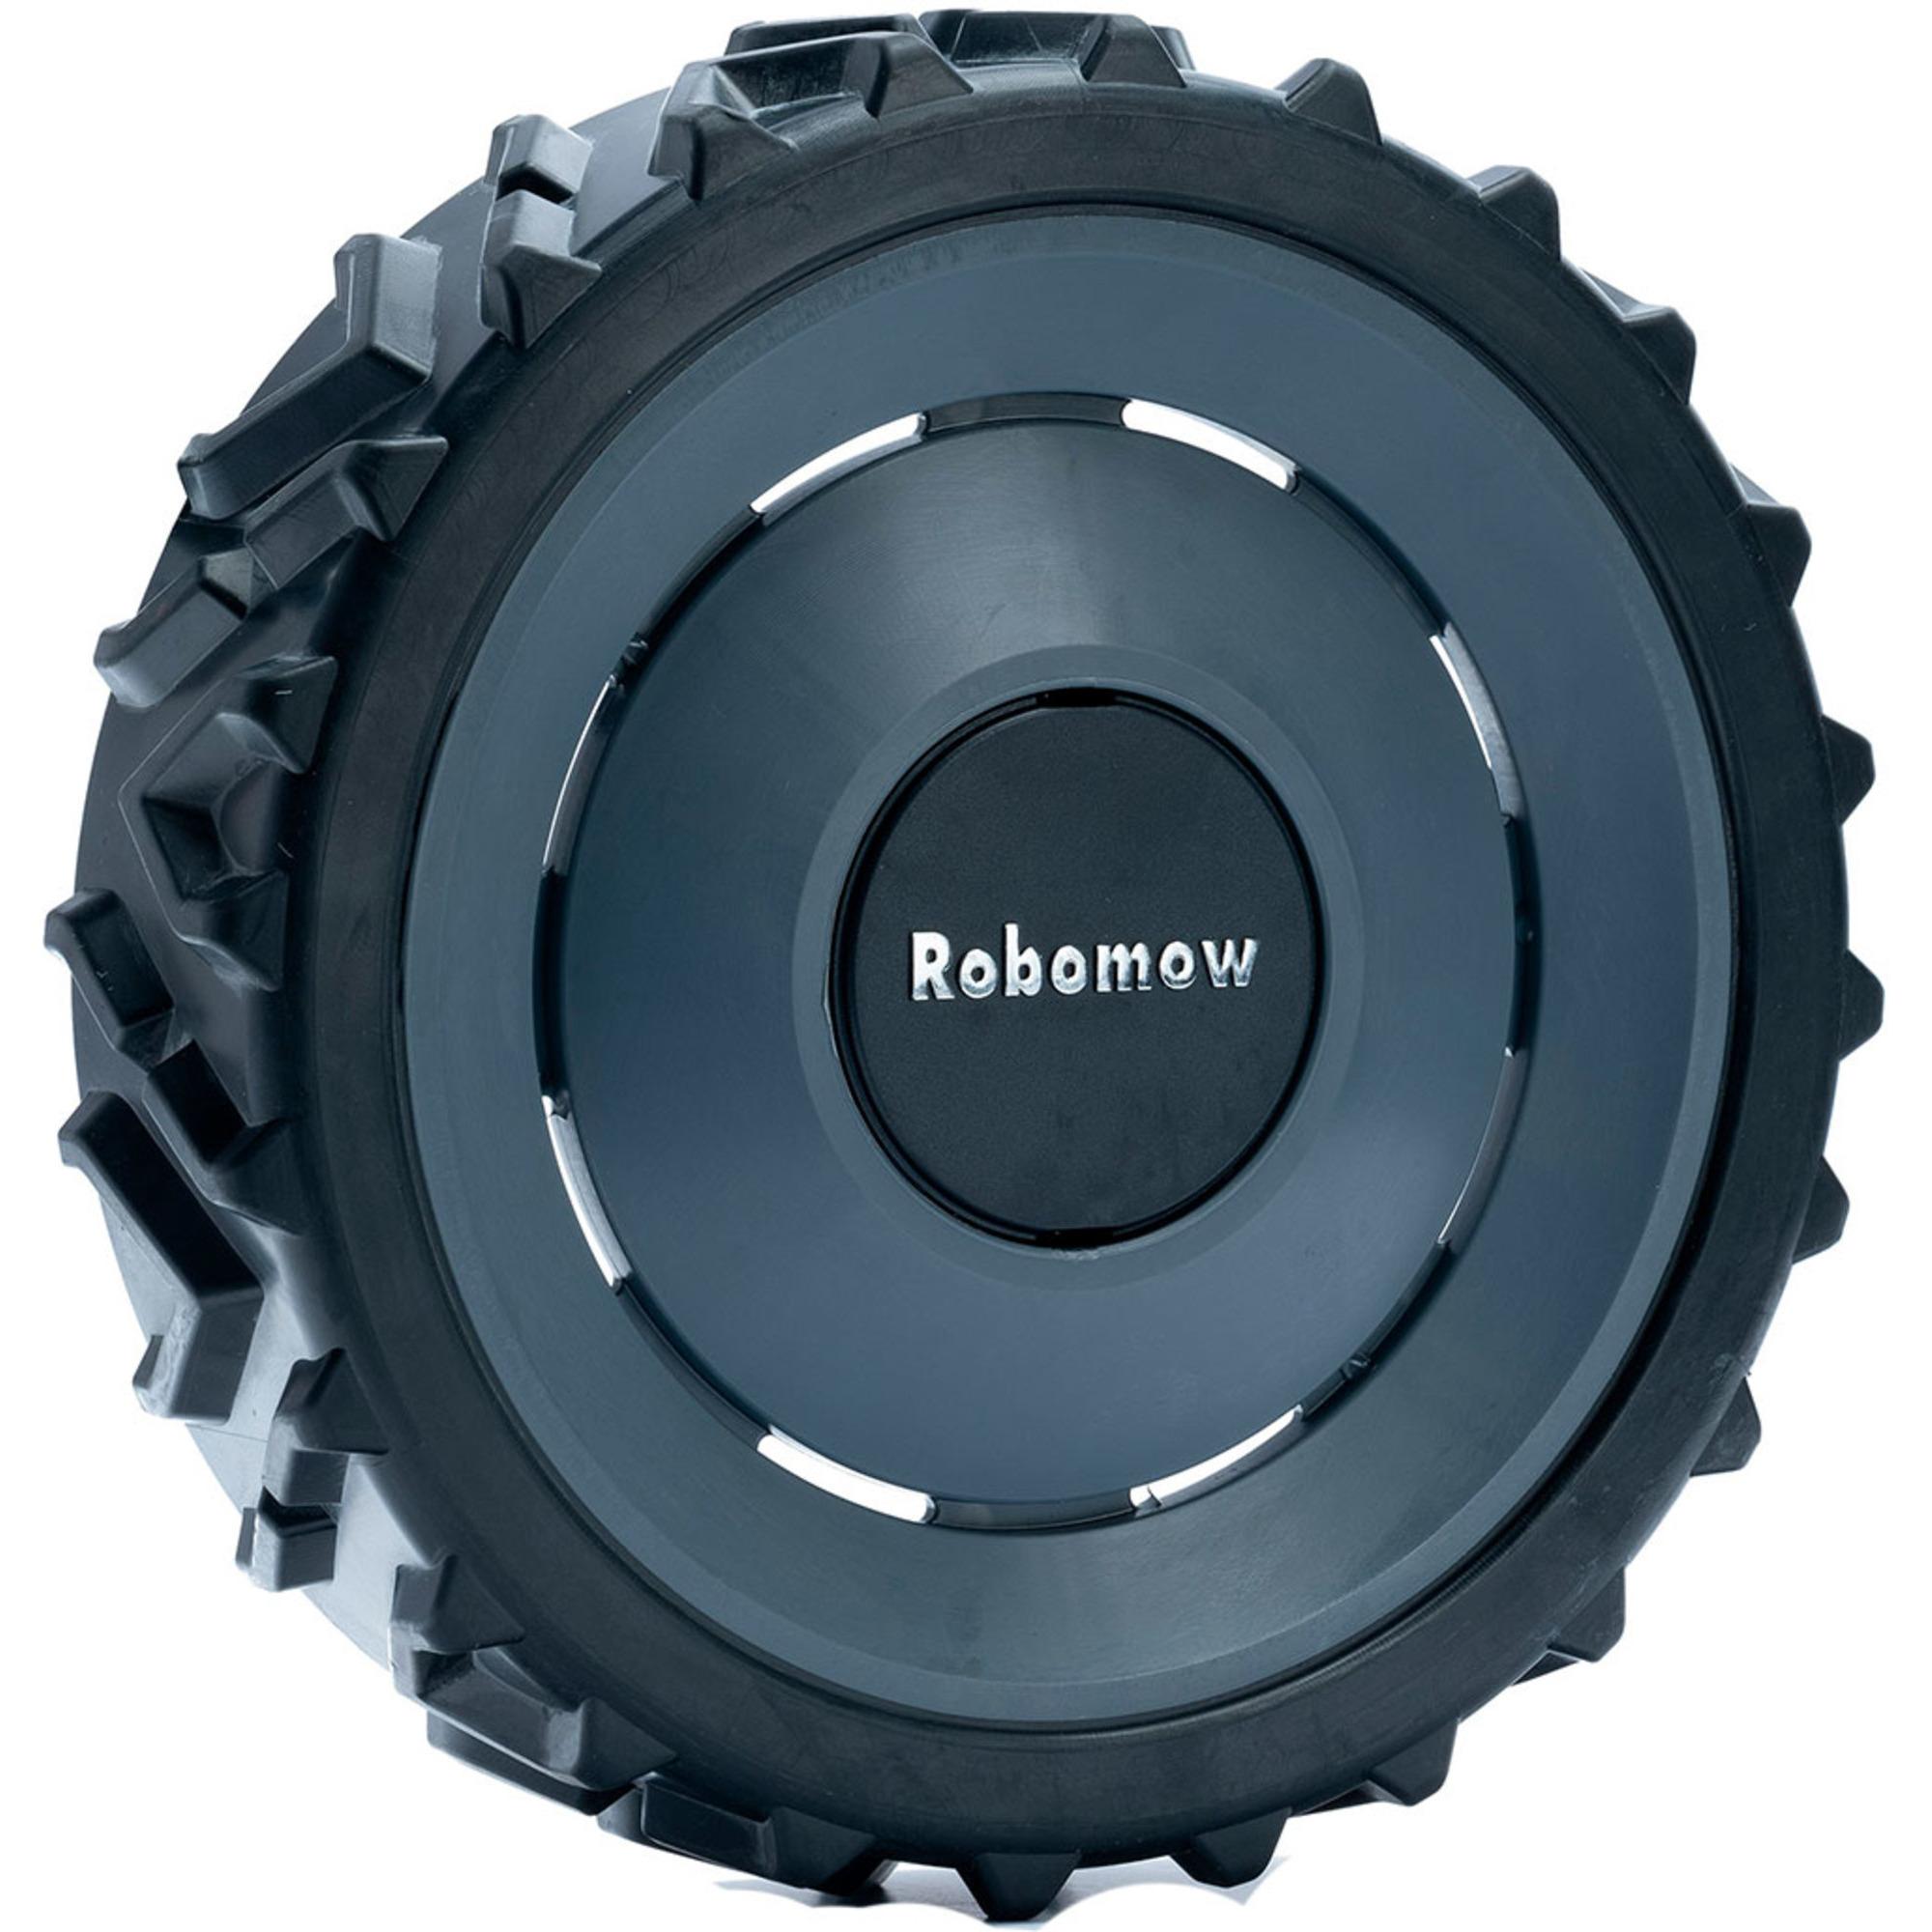 Robomow Hjul, 1 st., RM & City 110